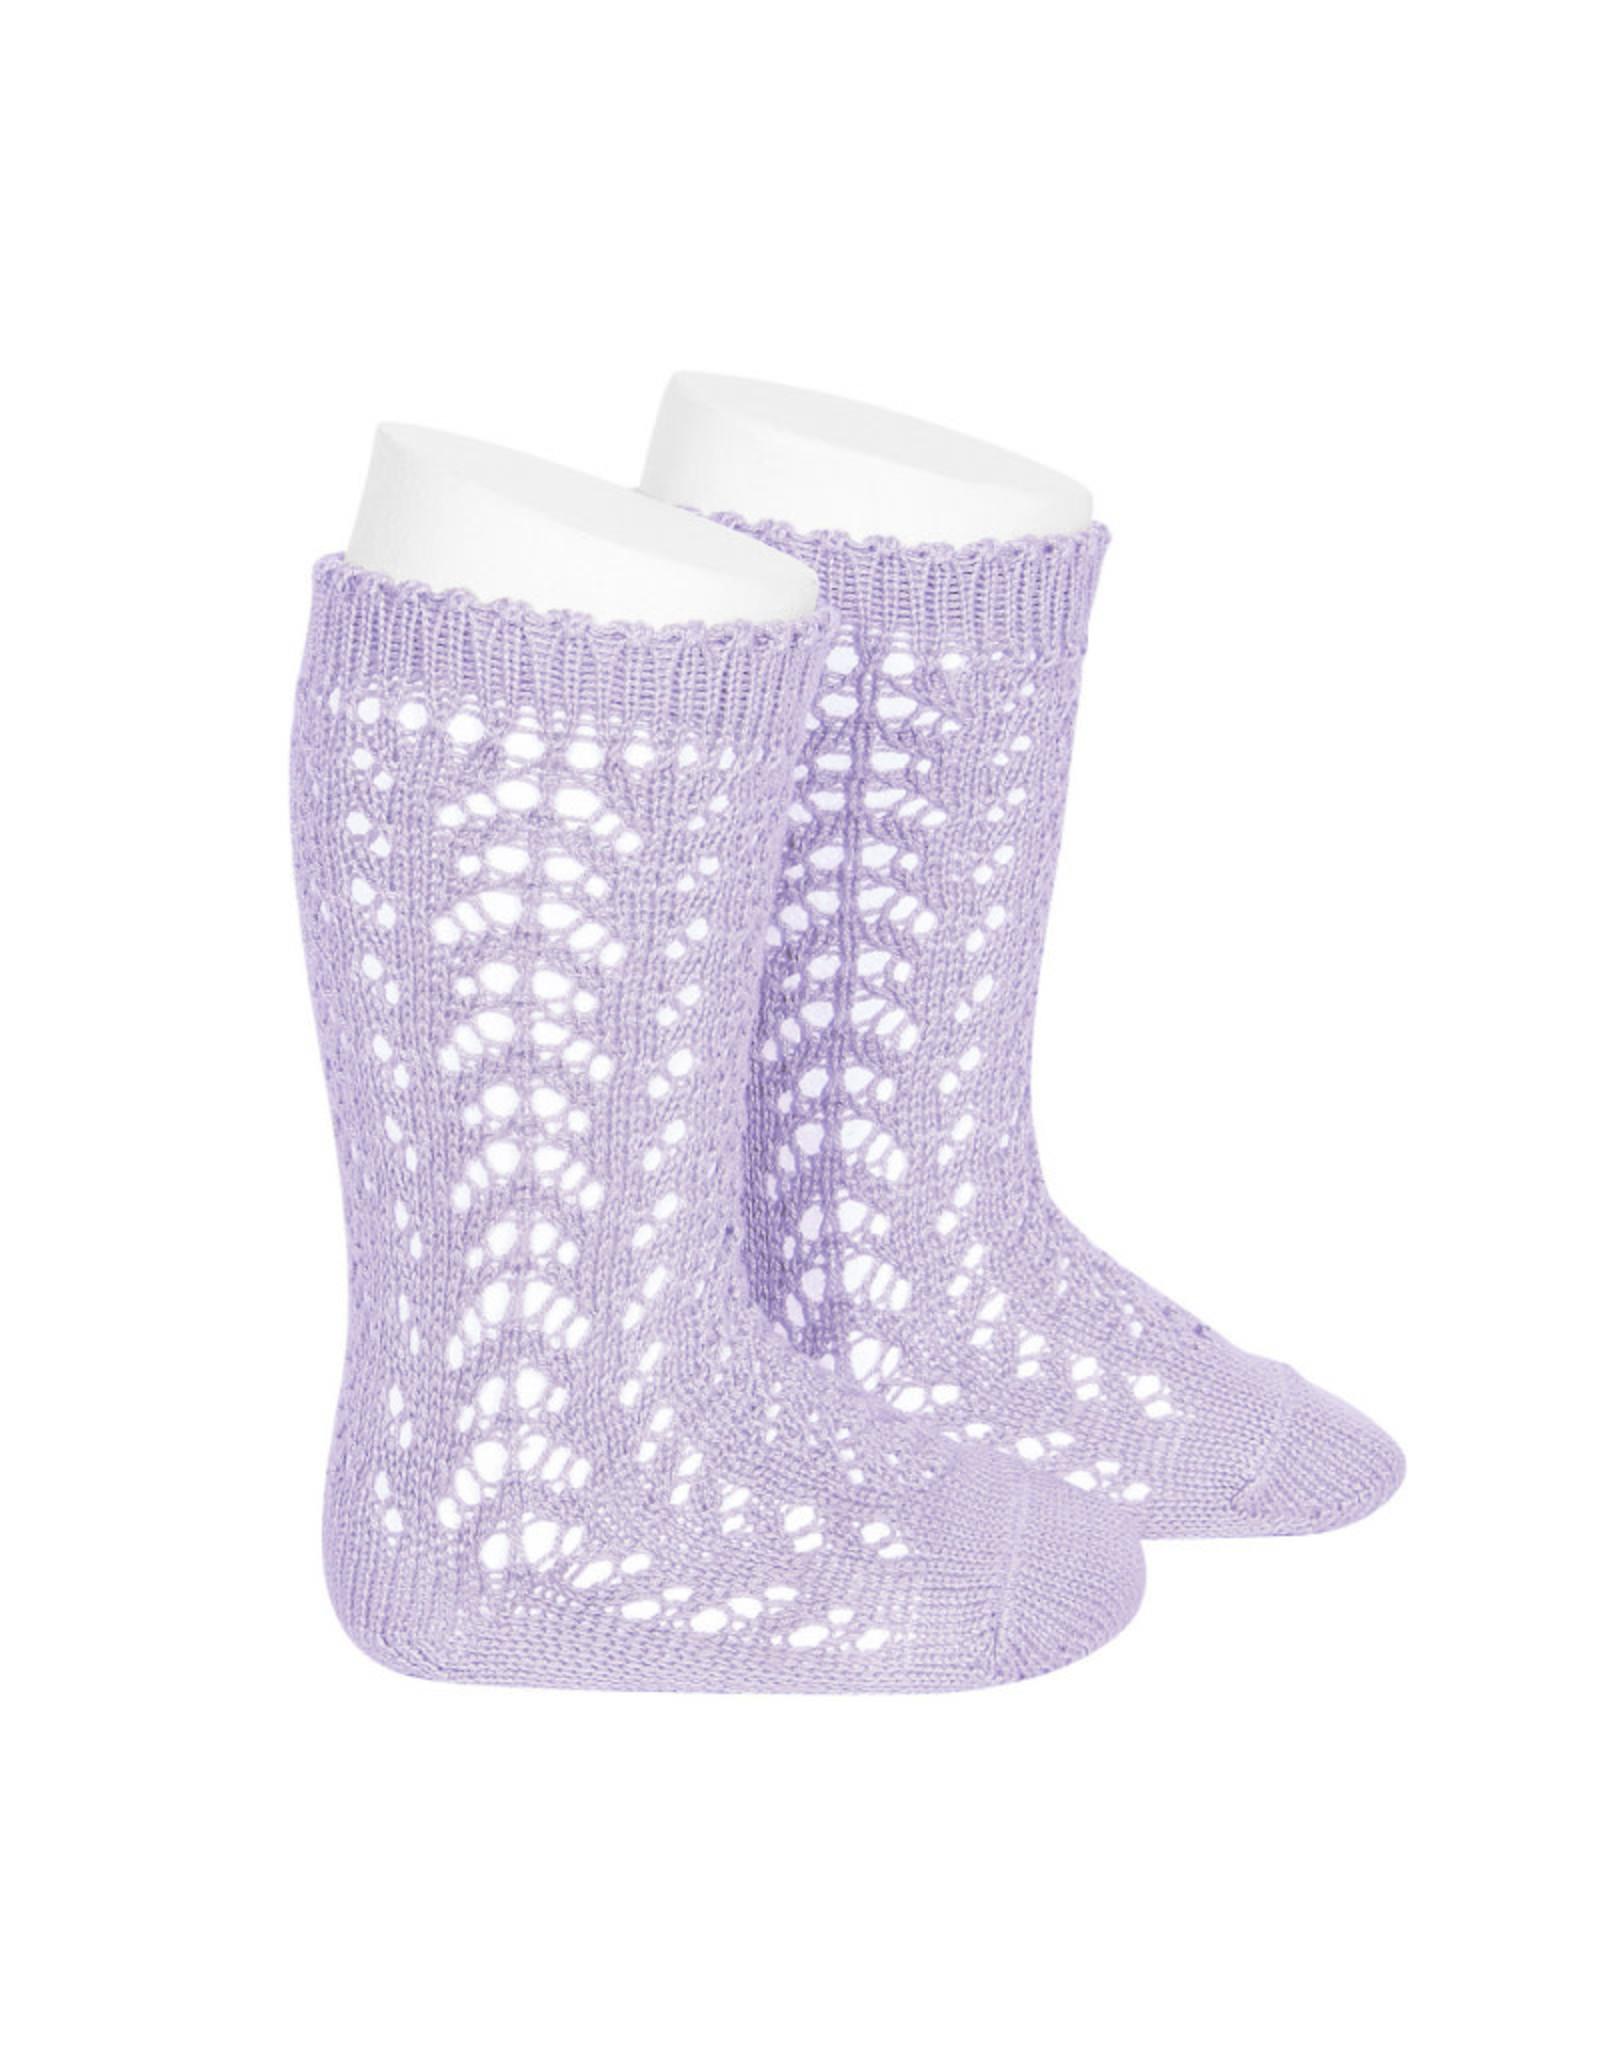 CONDOR Mauve Openwork Knee Socks